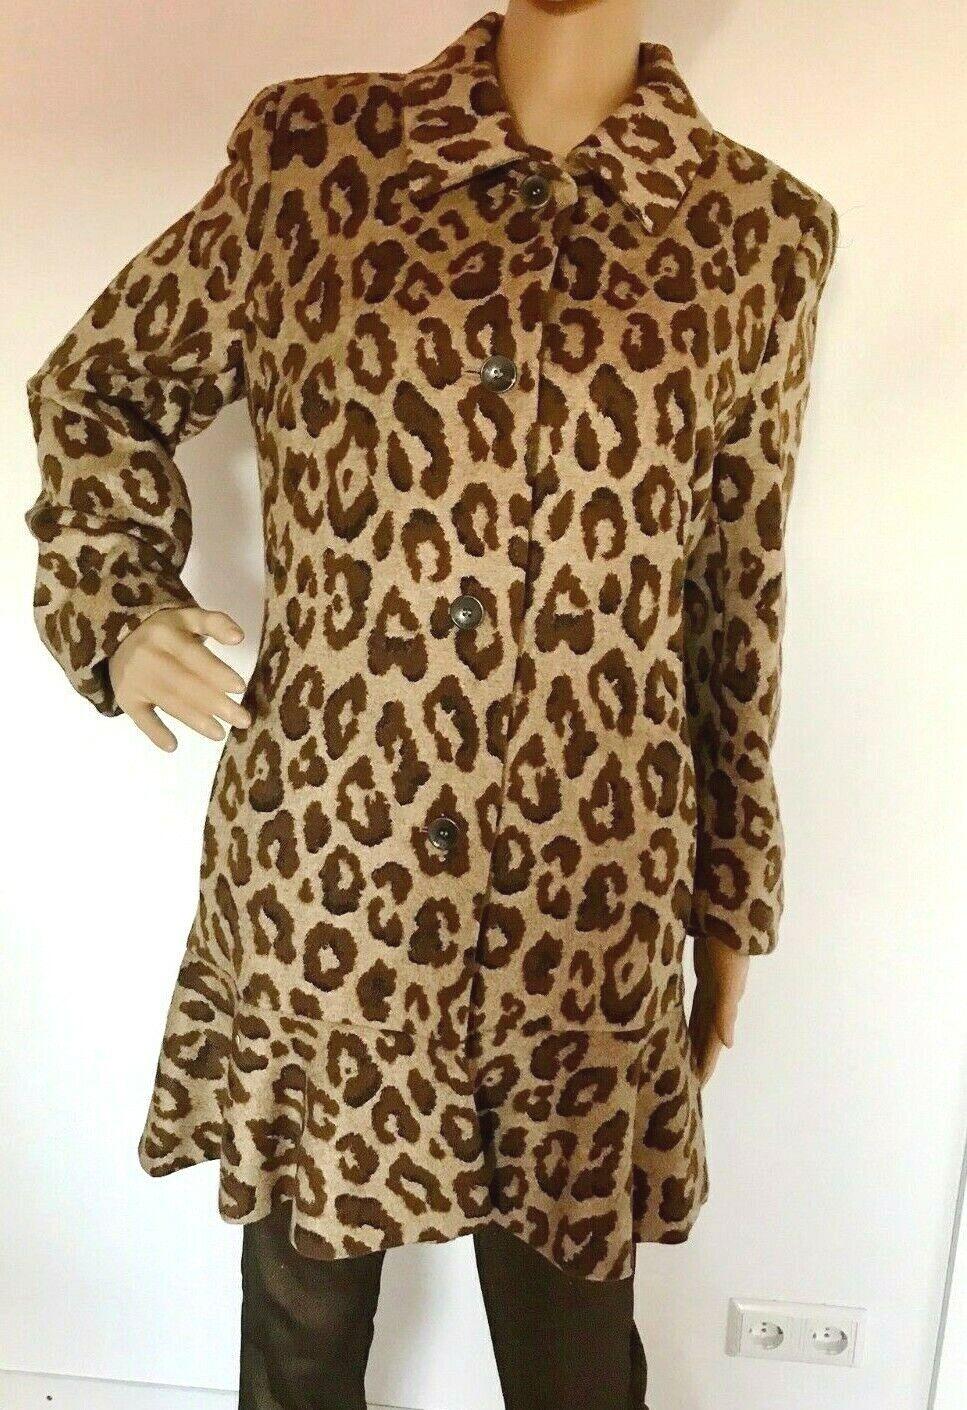 Escada lujo lana & seda  Mix abrigo animal print talla 40  contador genuino